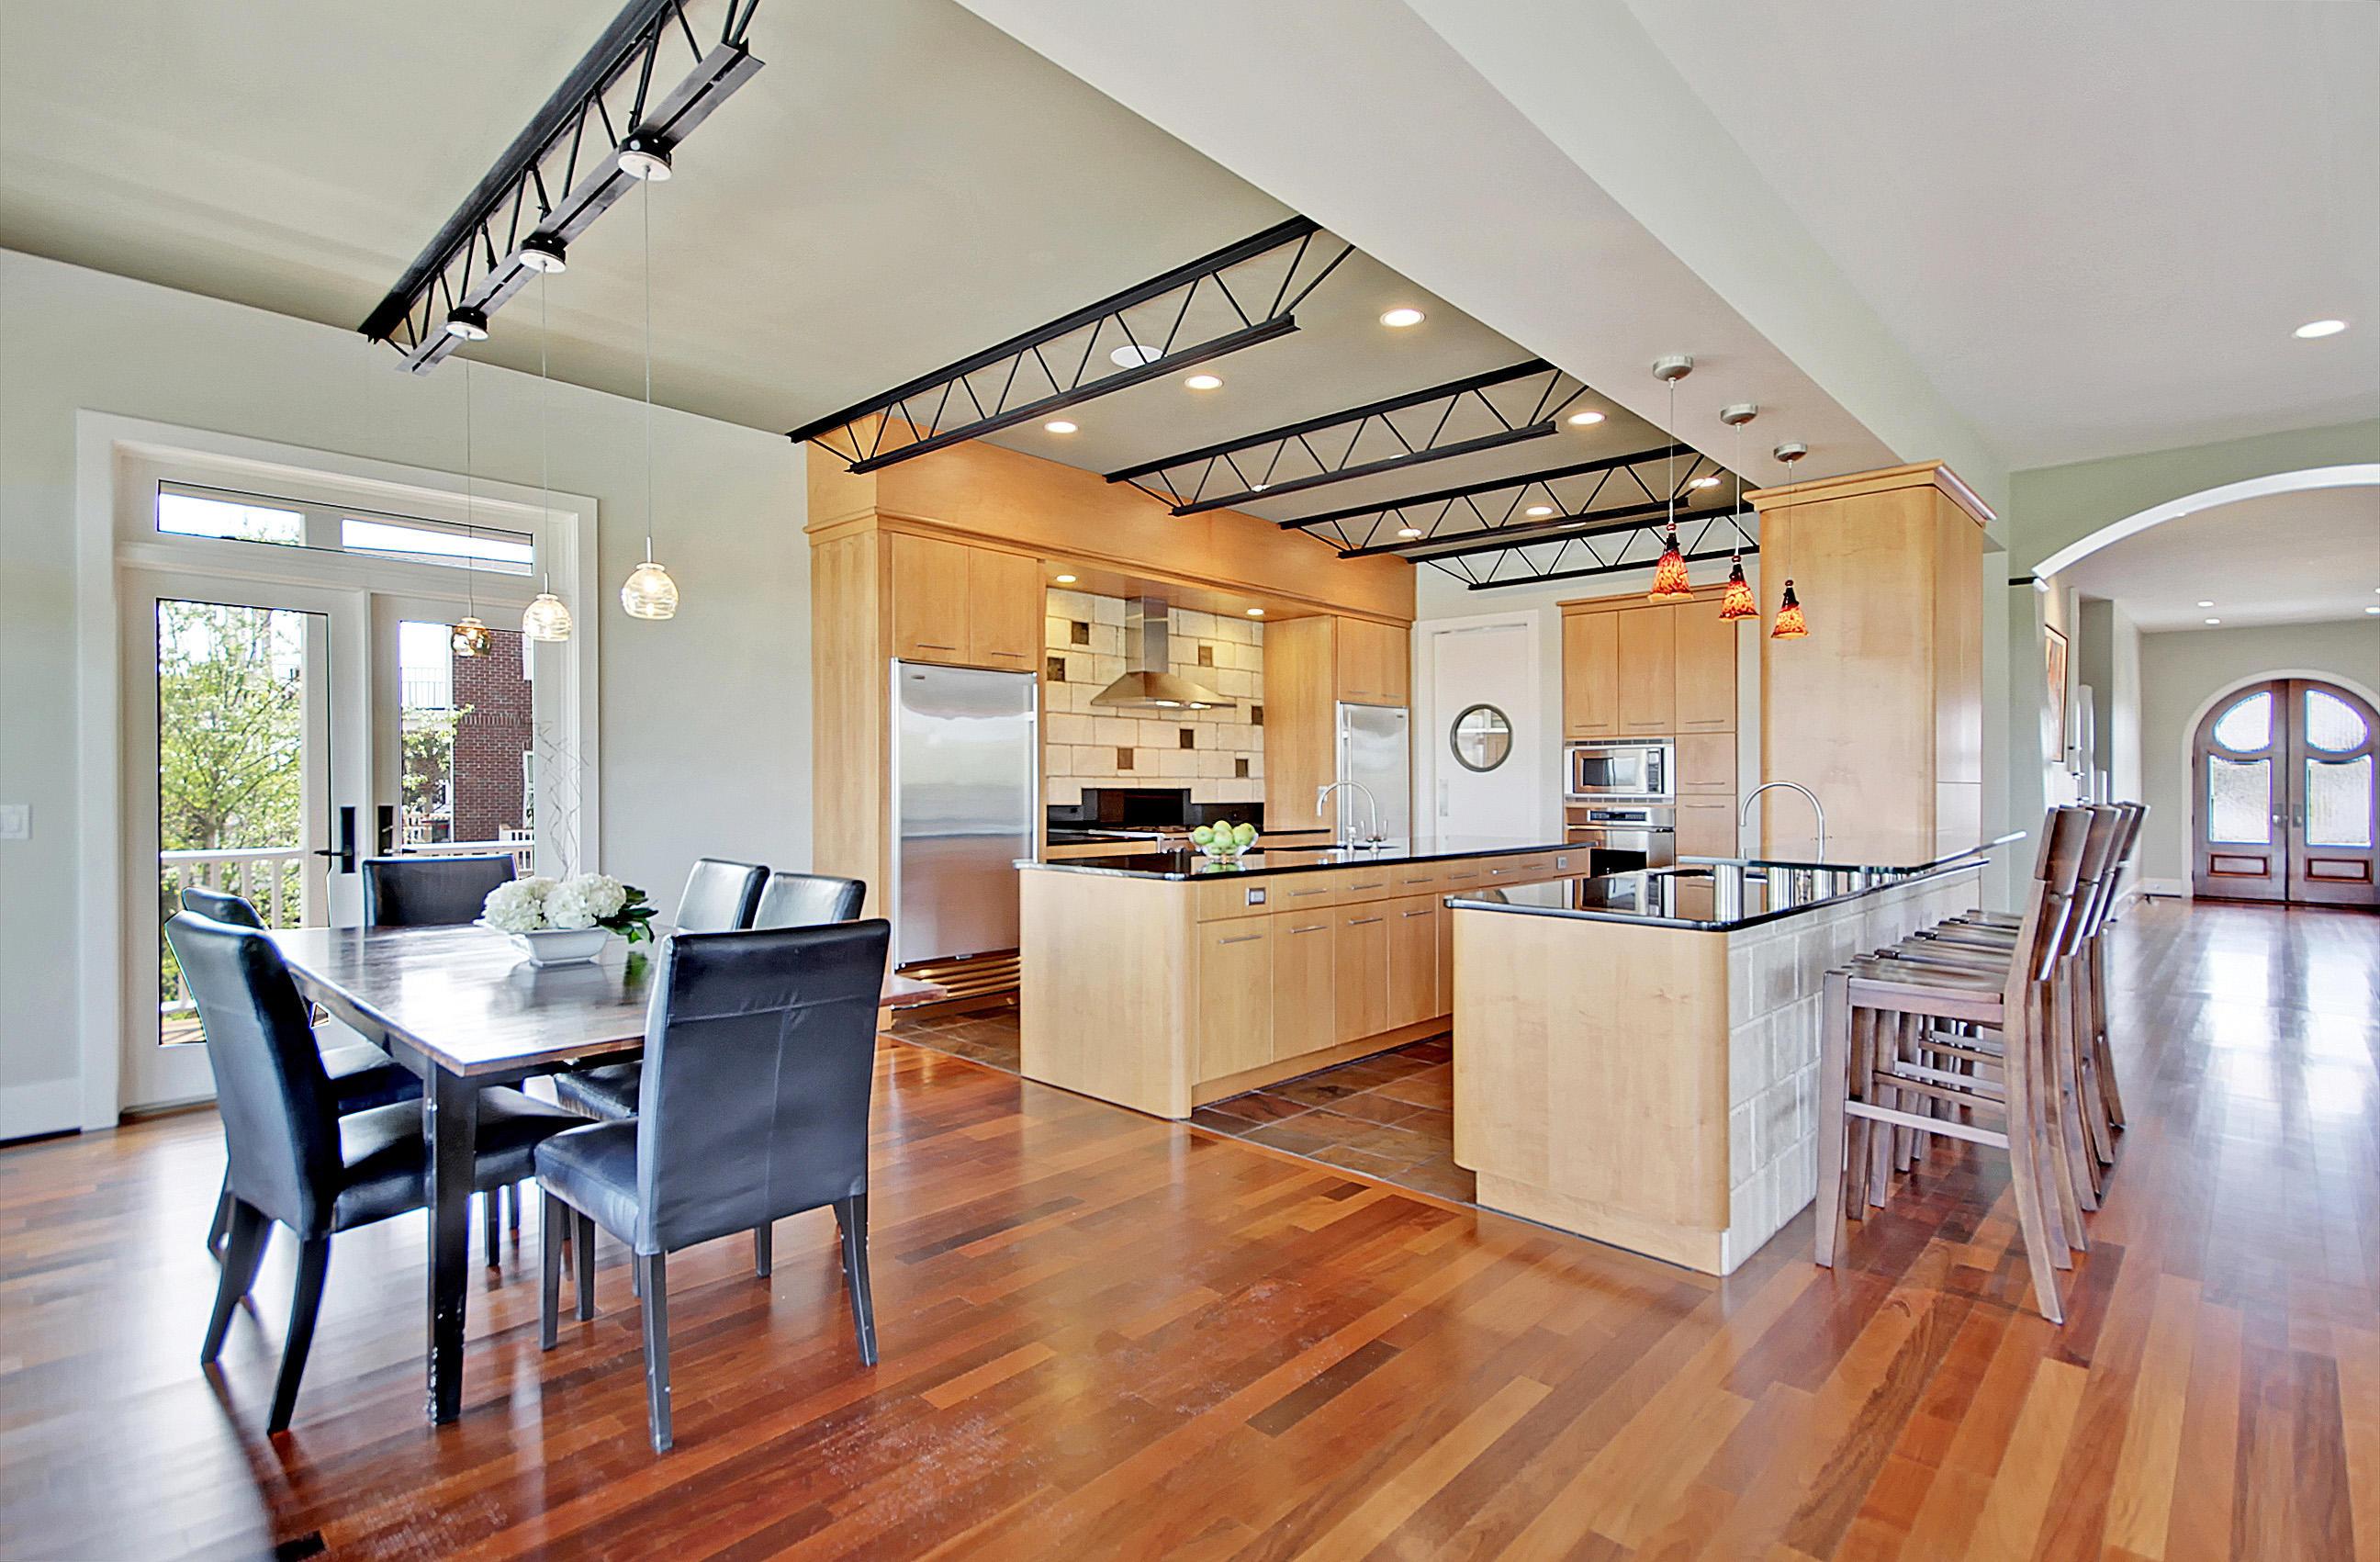 Beresford Creek Landing Homes For Sale - 1053 Rivershore, Charleston, SC - 13